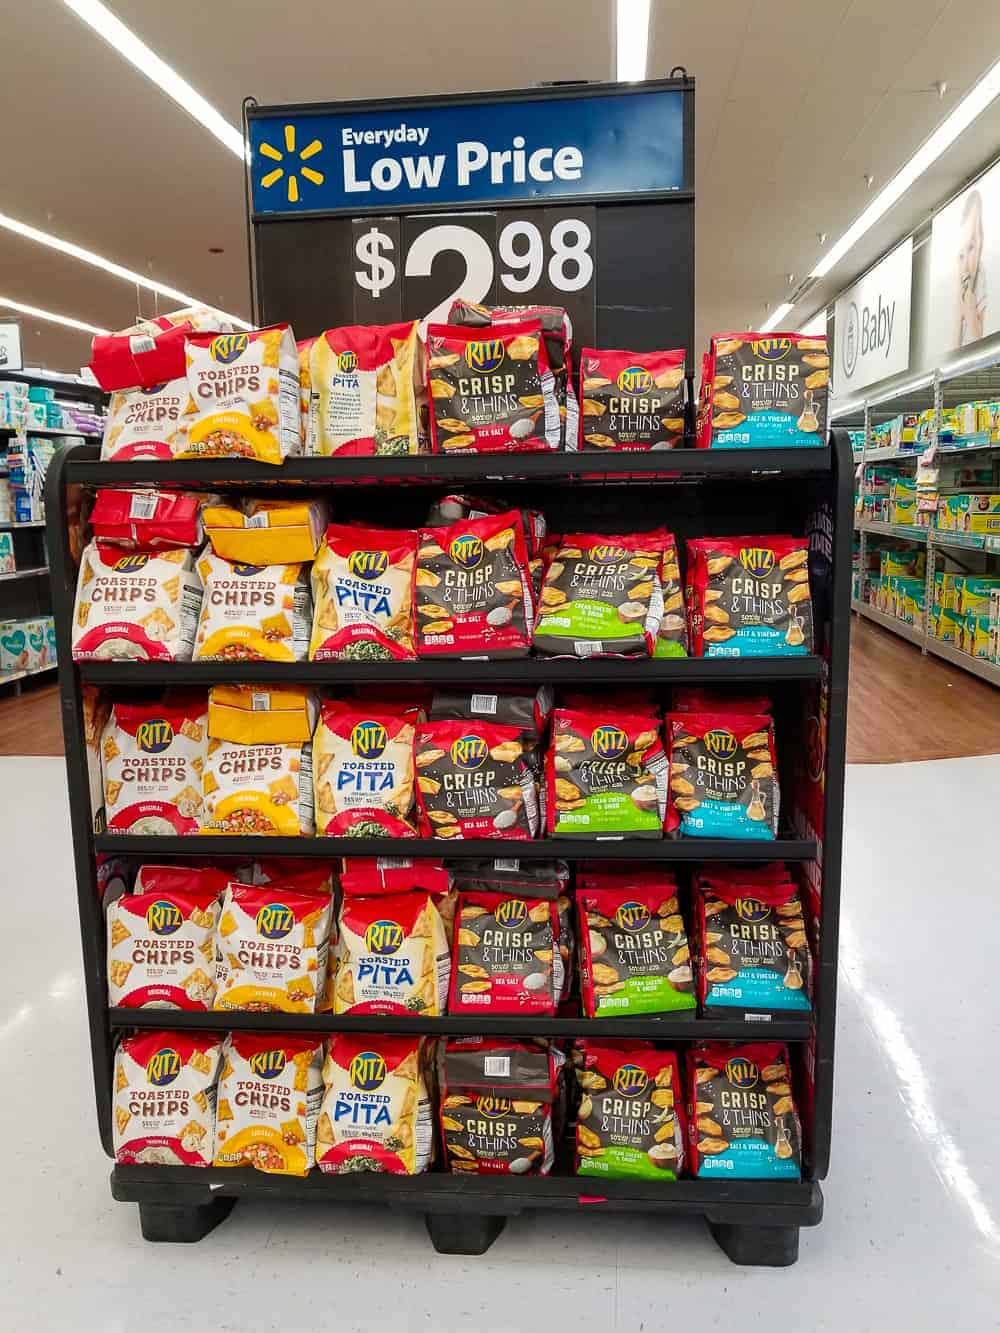 RITZ Crisp & Thins at Walmart on Game Day Rack